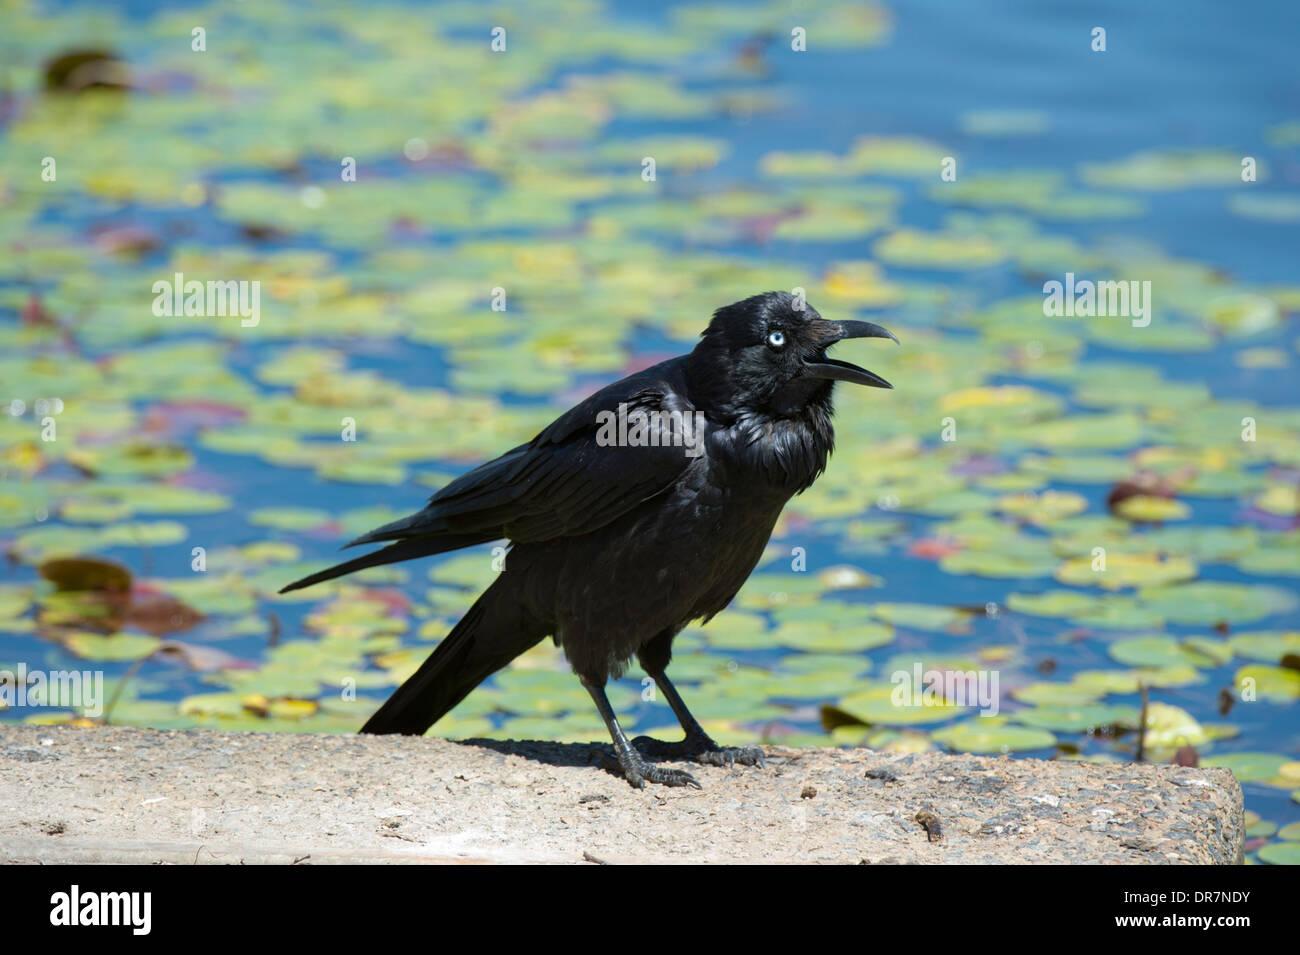 Australian Raven (Corvus coronoides) - New South Wales - Australia - Stock Image